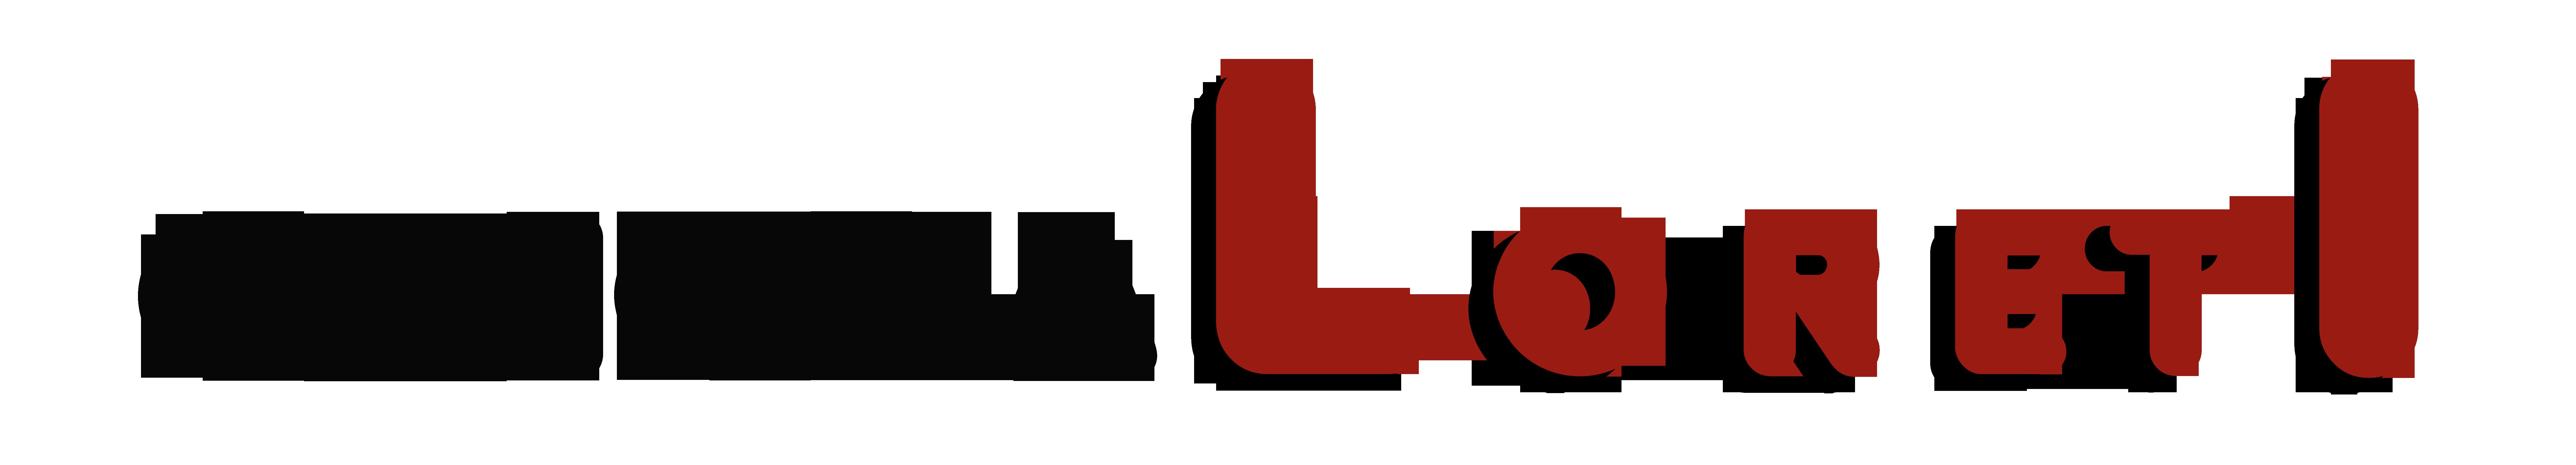 Officina Loreti Logo